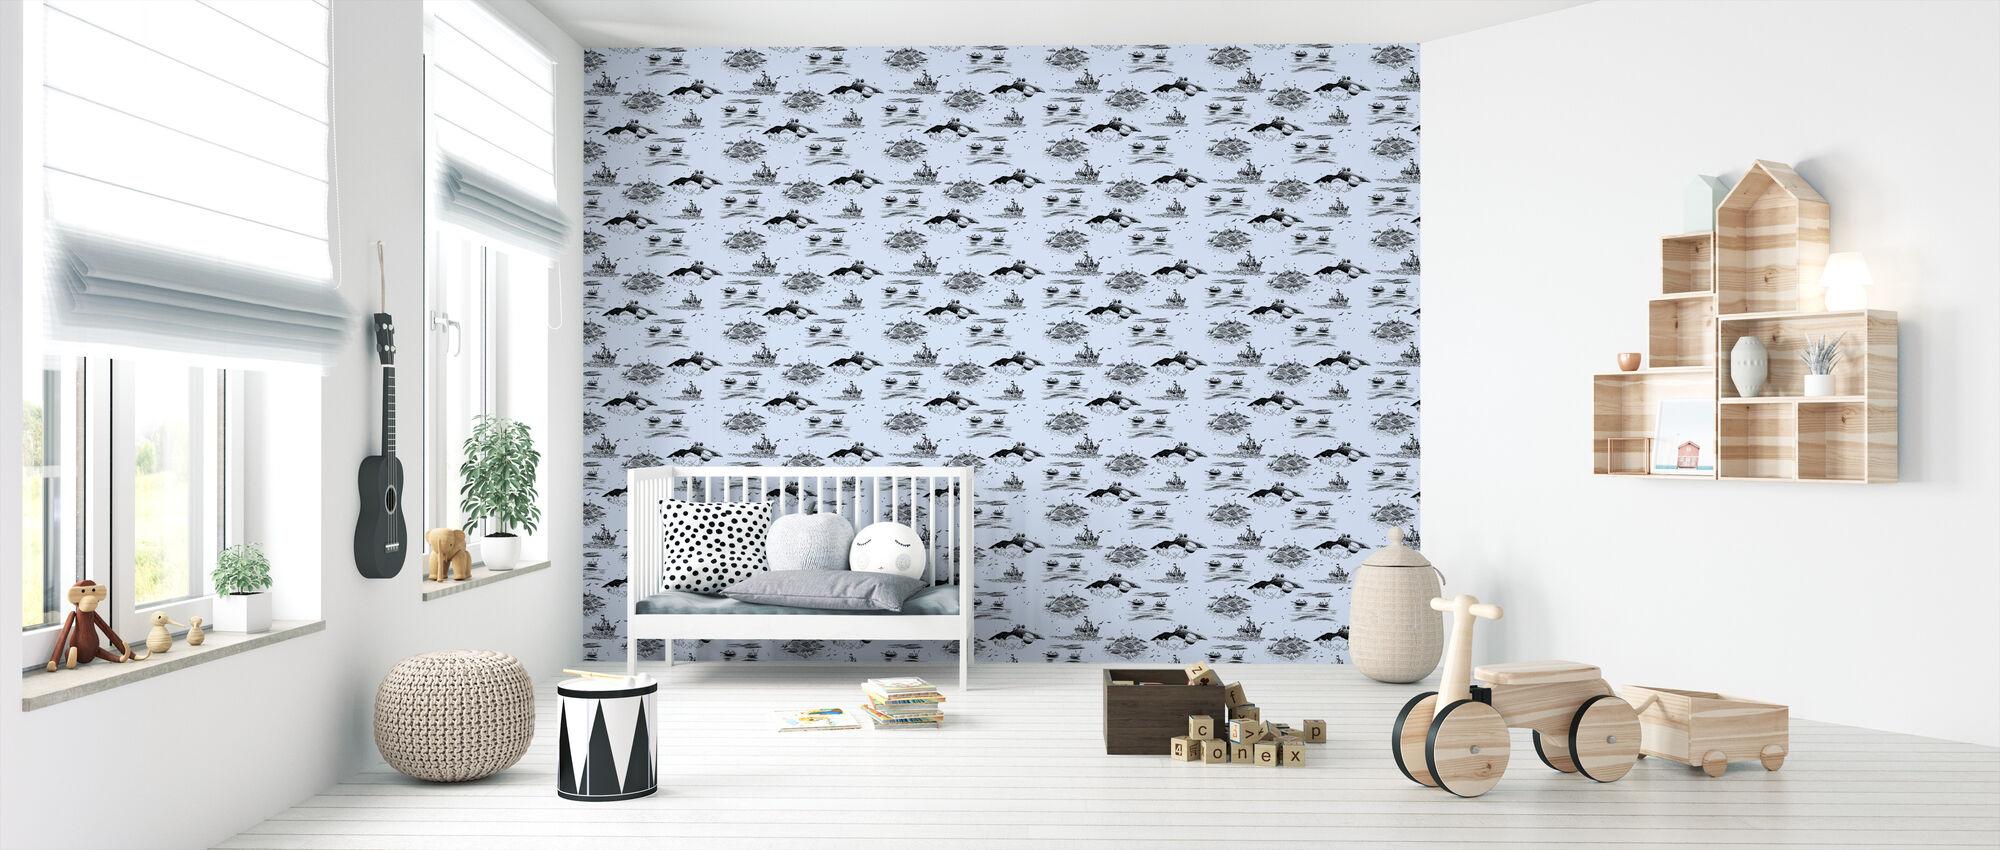 Moomin - At Sea - Wallpaper - Nursery